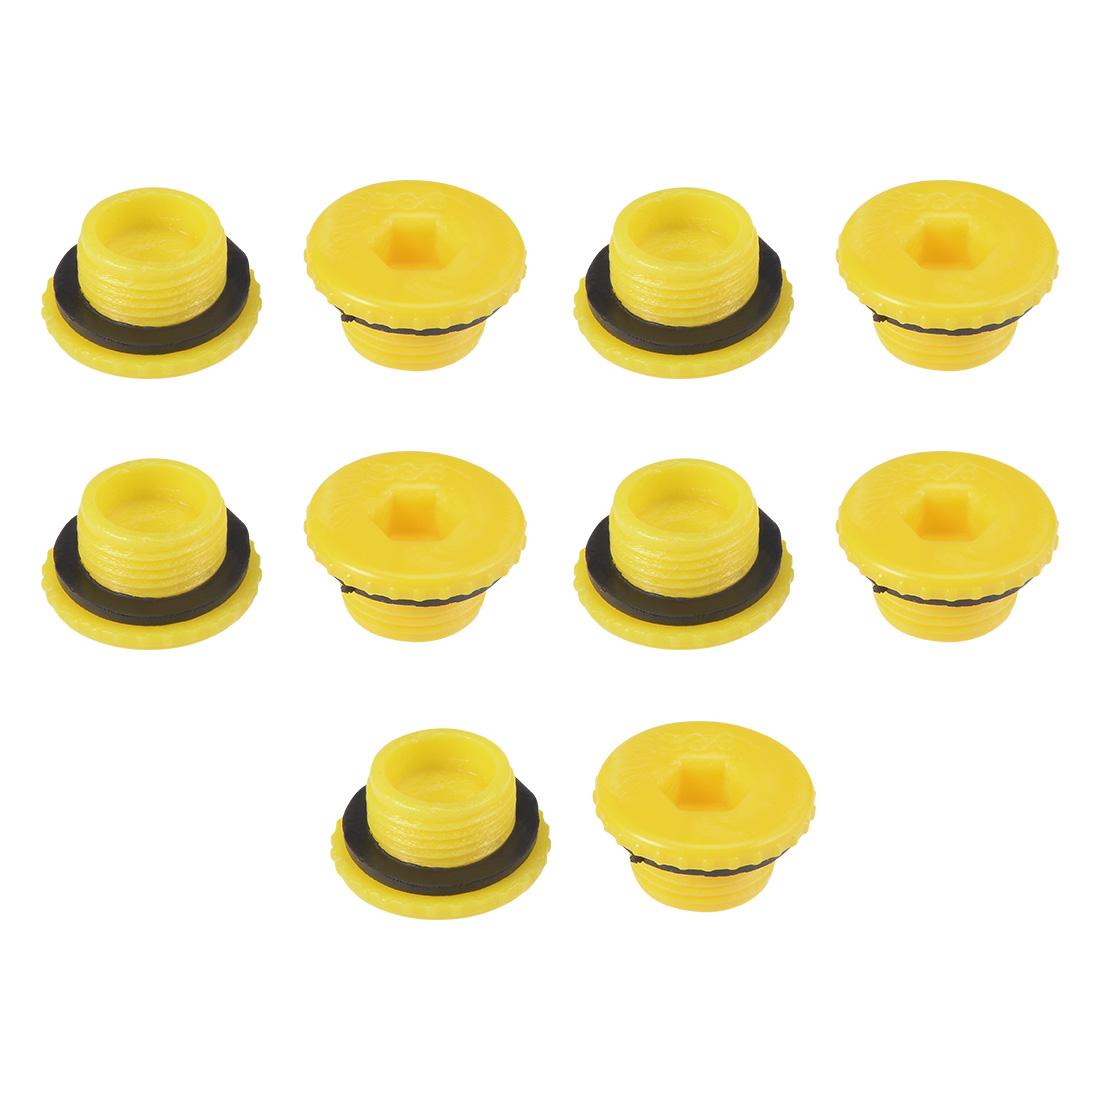 MLD-G3/8 G3/8 Hex Socket Design PE Male Threaded Sealing Cap Yellow 10pcs